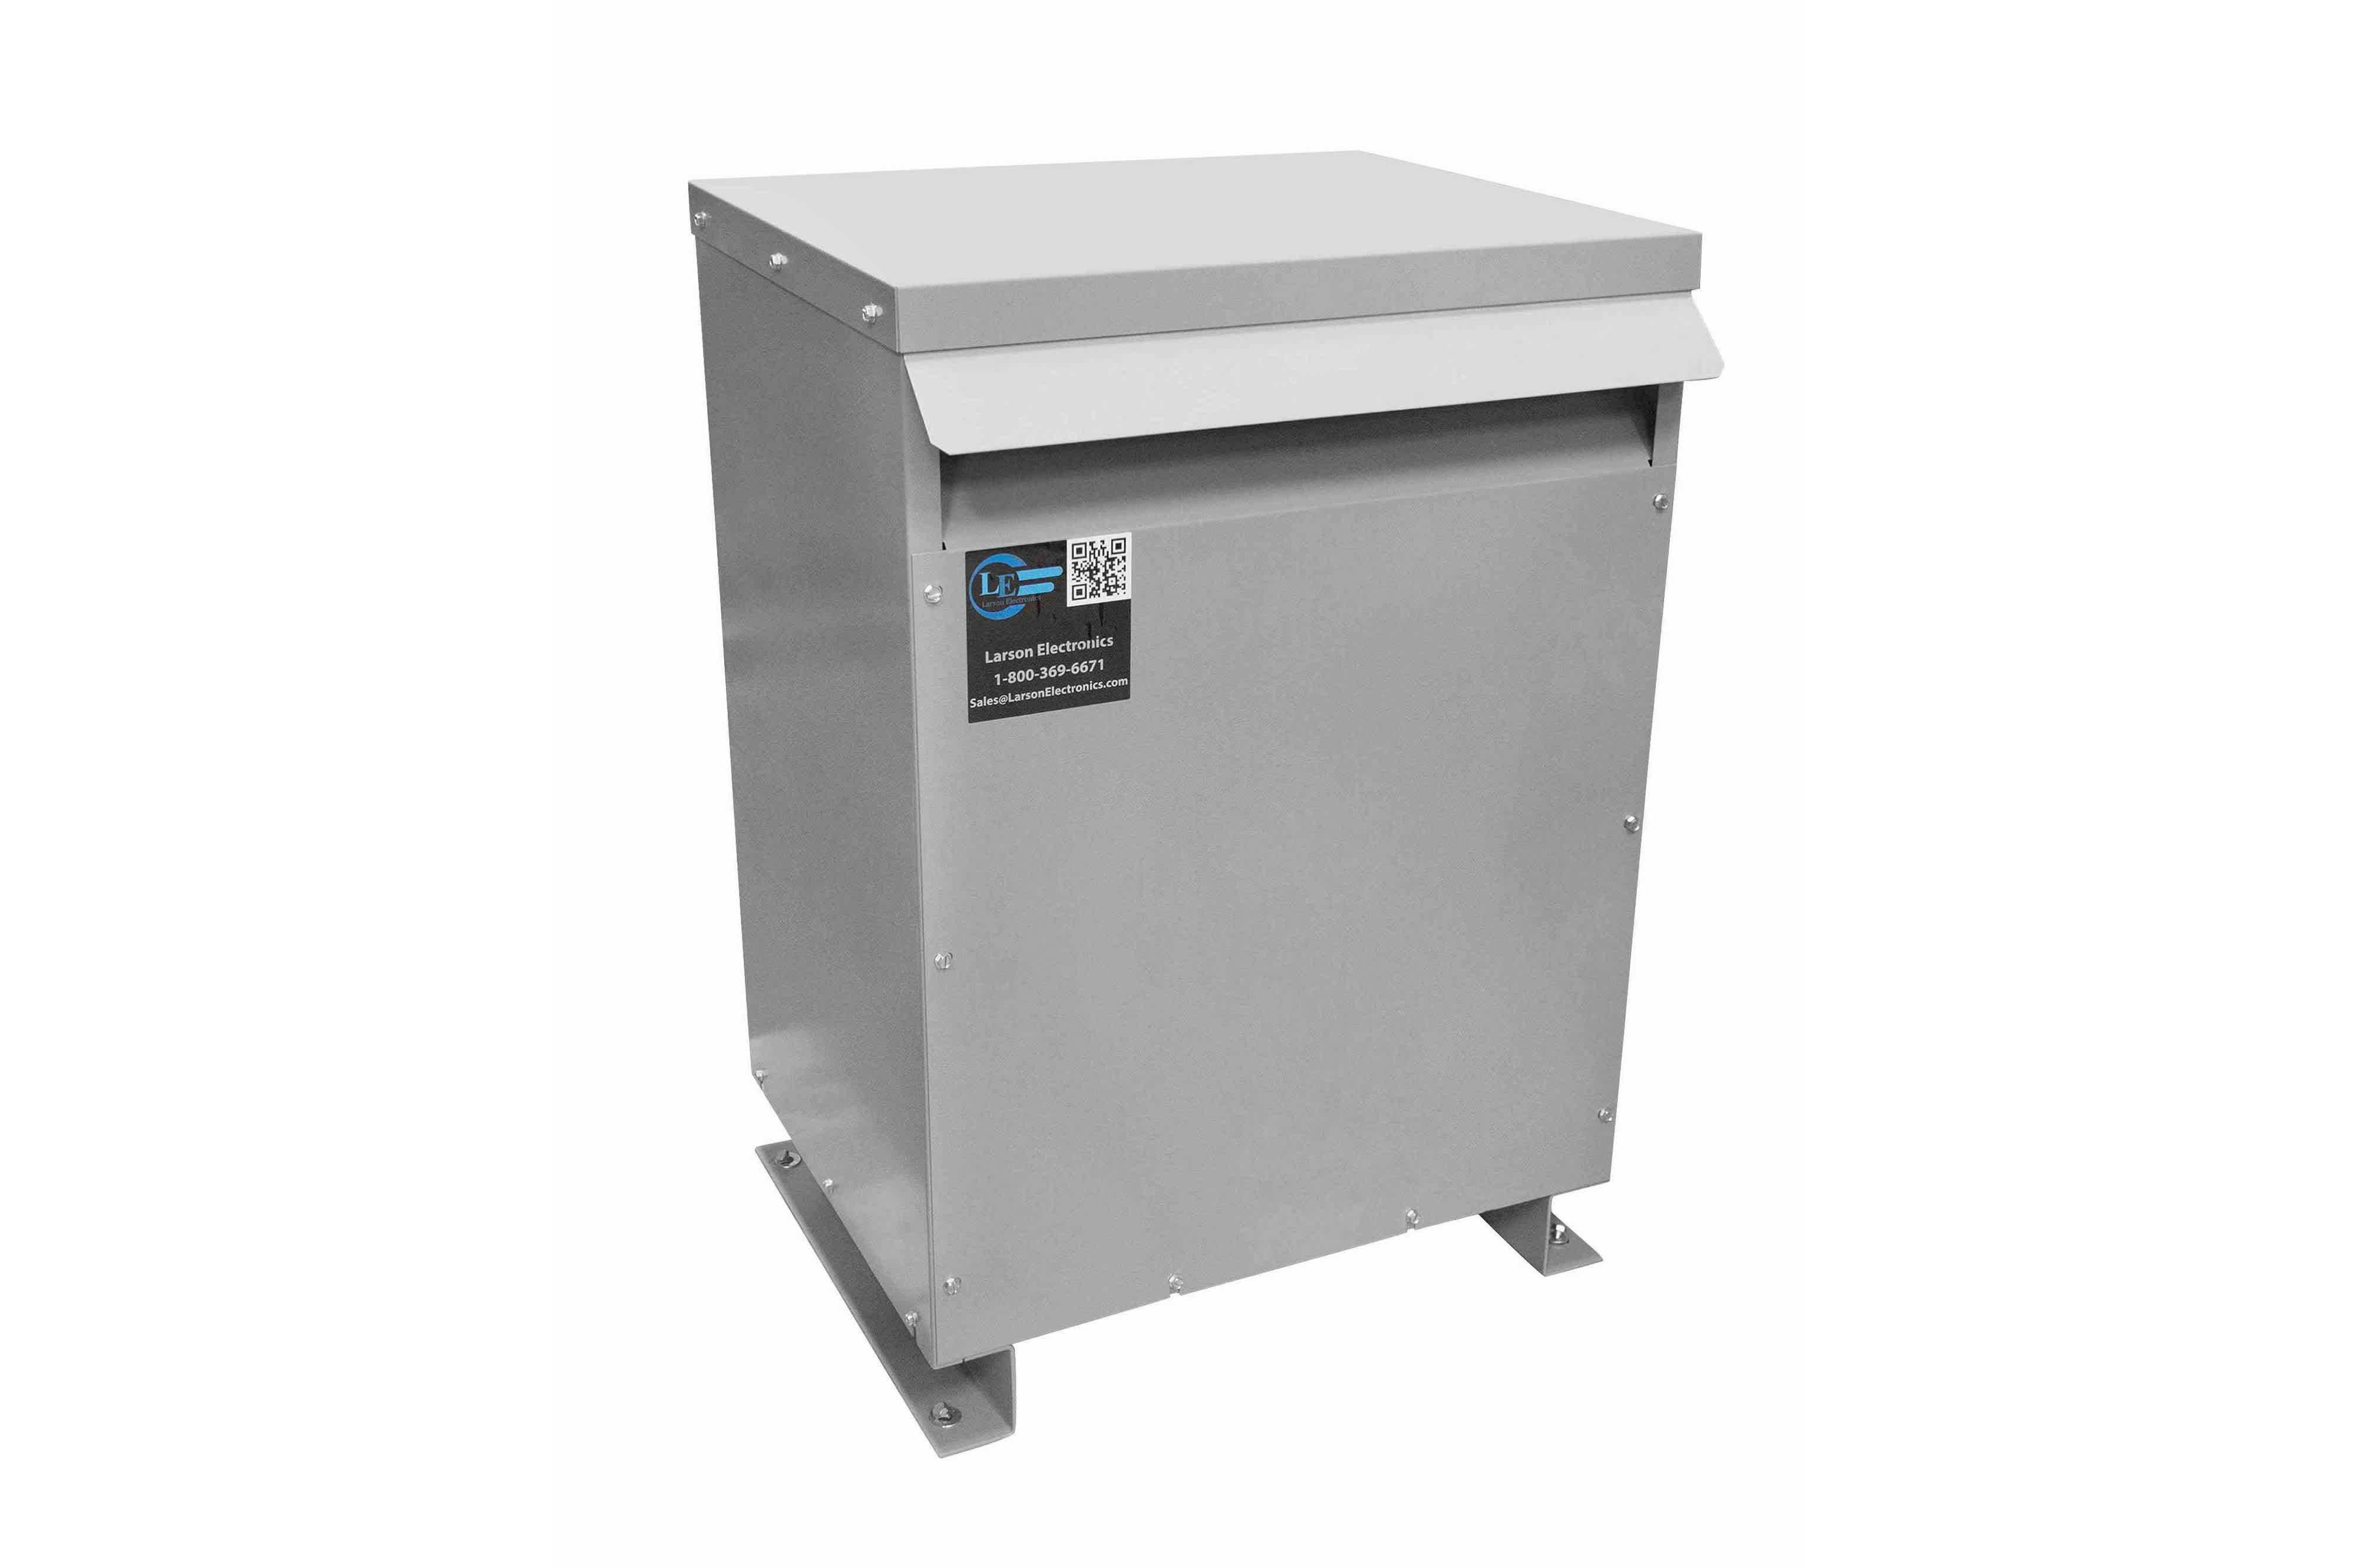 25 kVA 3PH Isolation Transformer, 600V Wye Primary, 240V Delta Secondary, N3R, Ventilated, 60 Hz